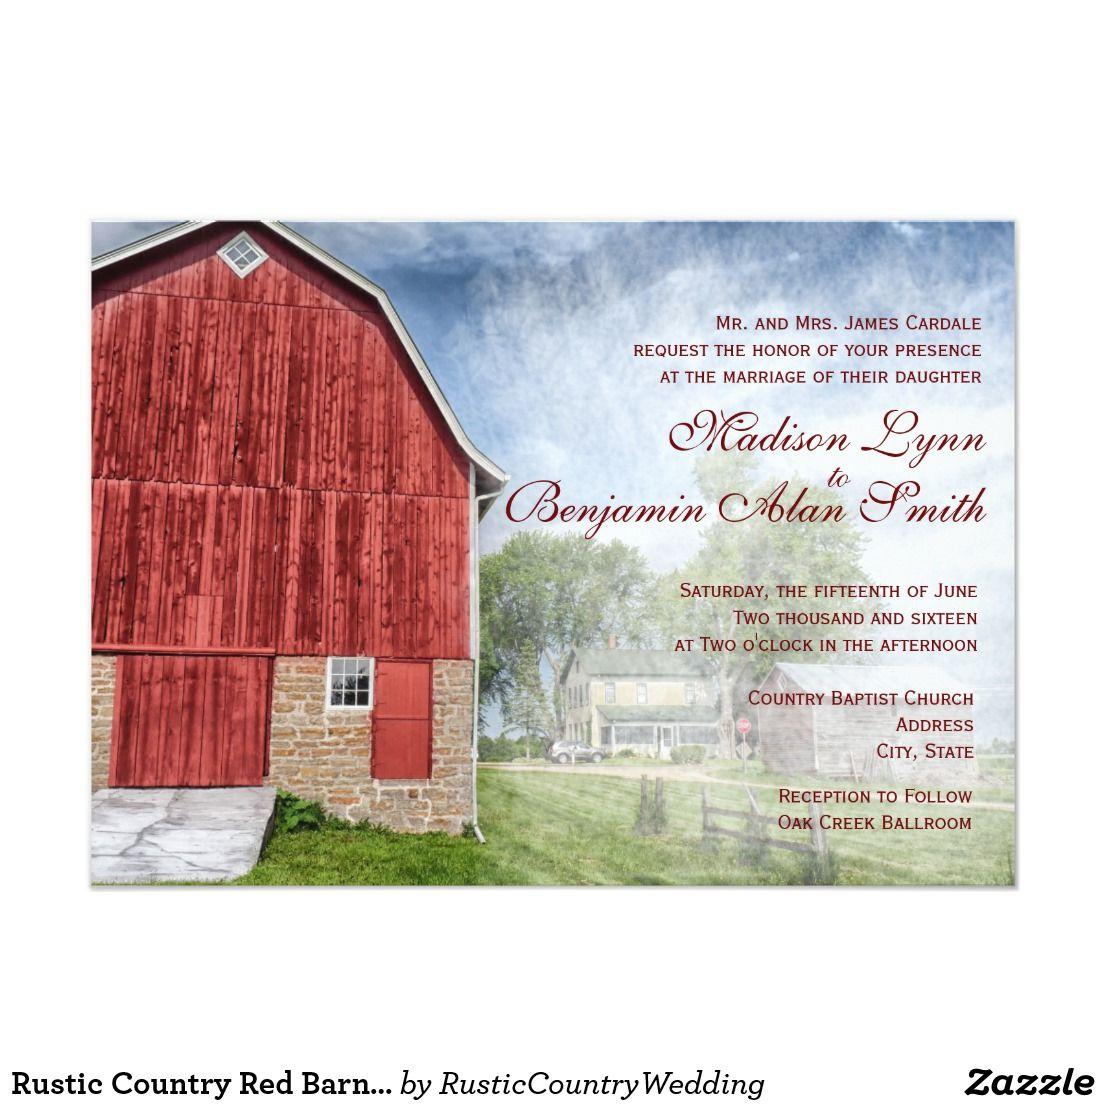 Rustic Country Red Barn Farm Wedding Invitations | Red barns, Barn ...